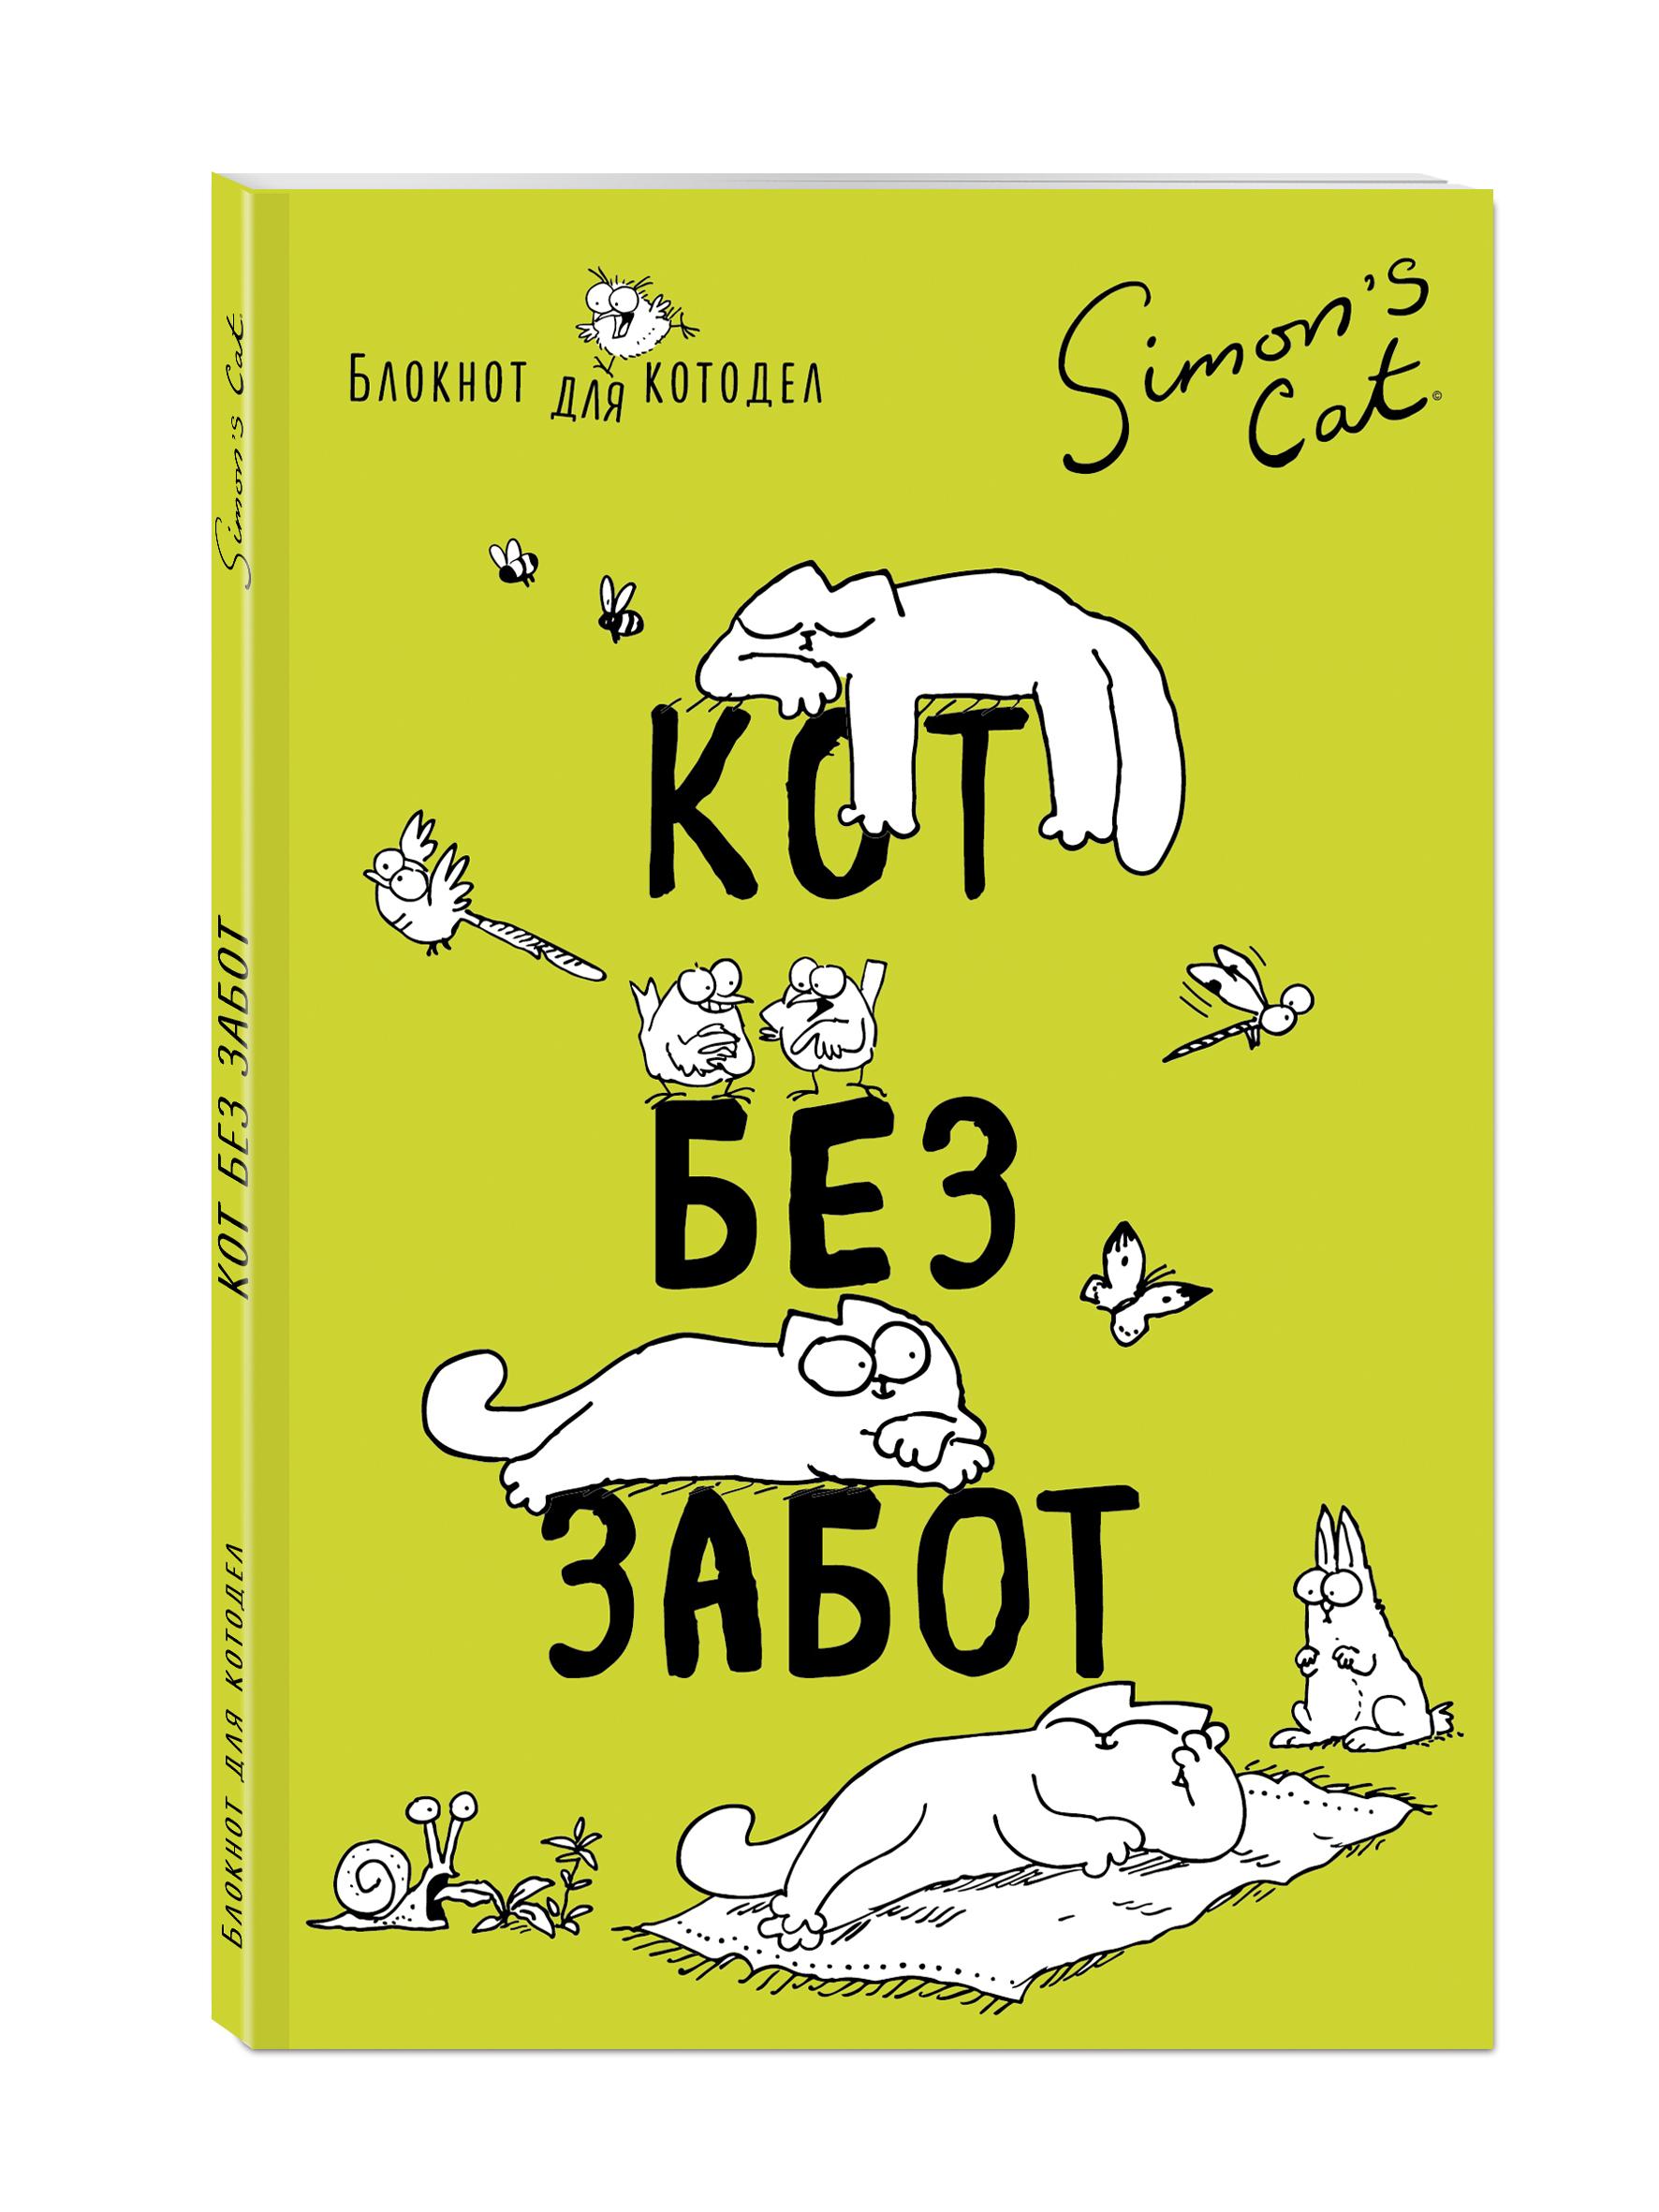 Саймон Тофилд Блокнот. Кот Саймона. Кот без забот саймон тофилд календарь настенный 2019 кот саймона